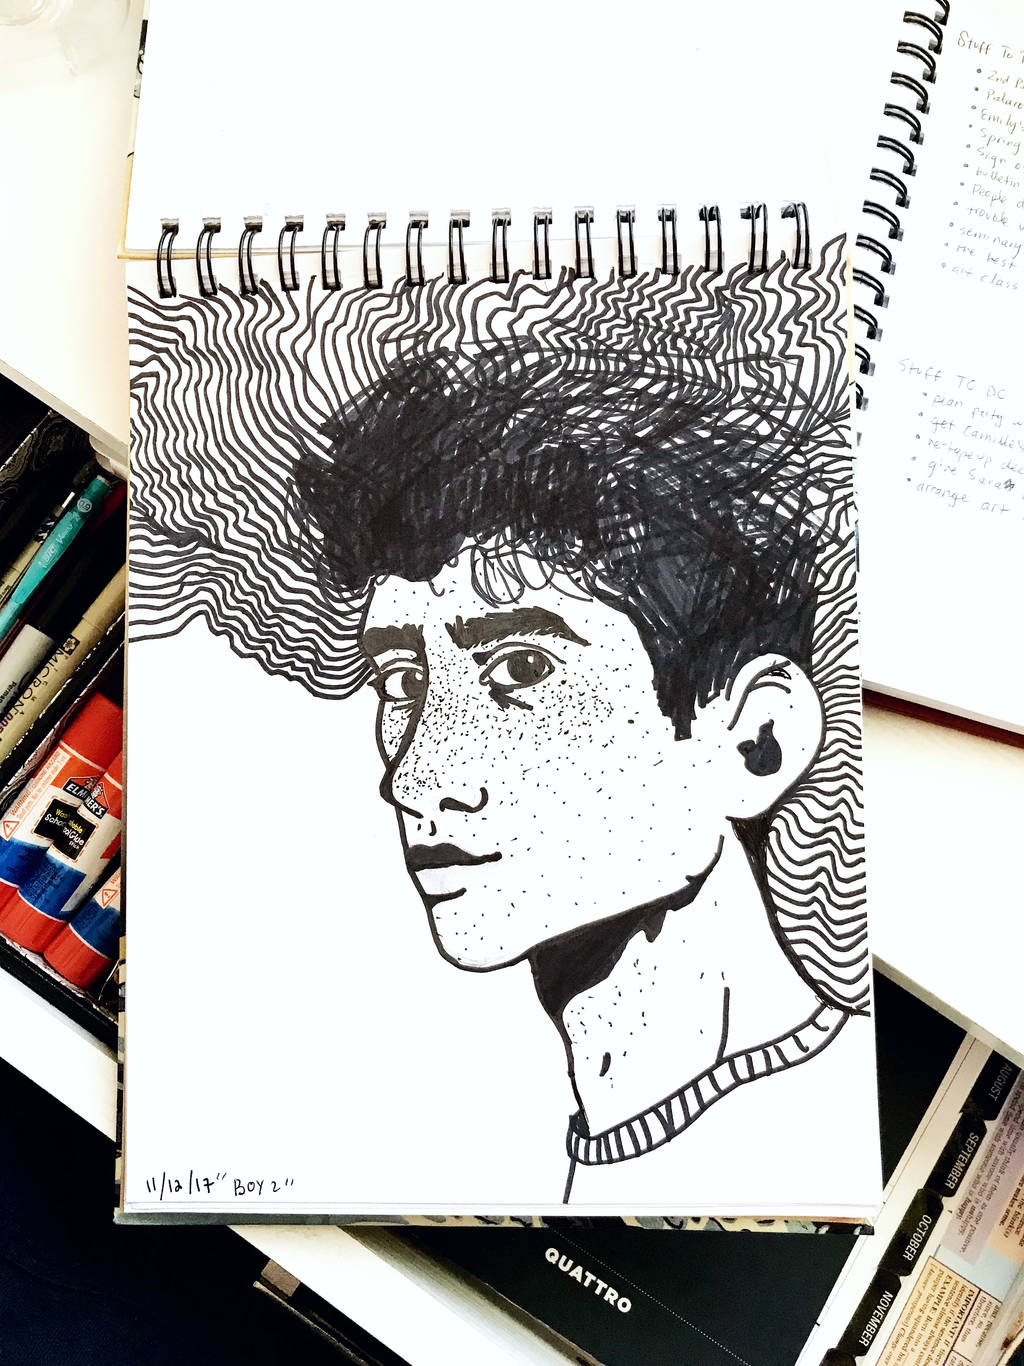 Eduardo by wingedmusician